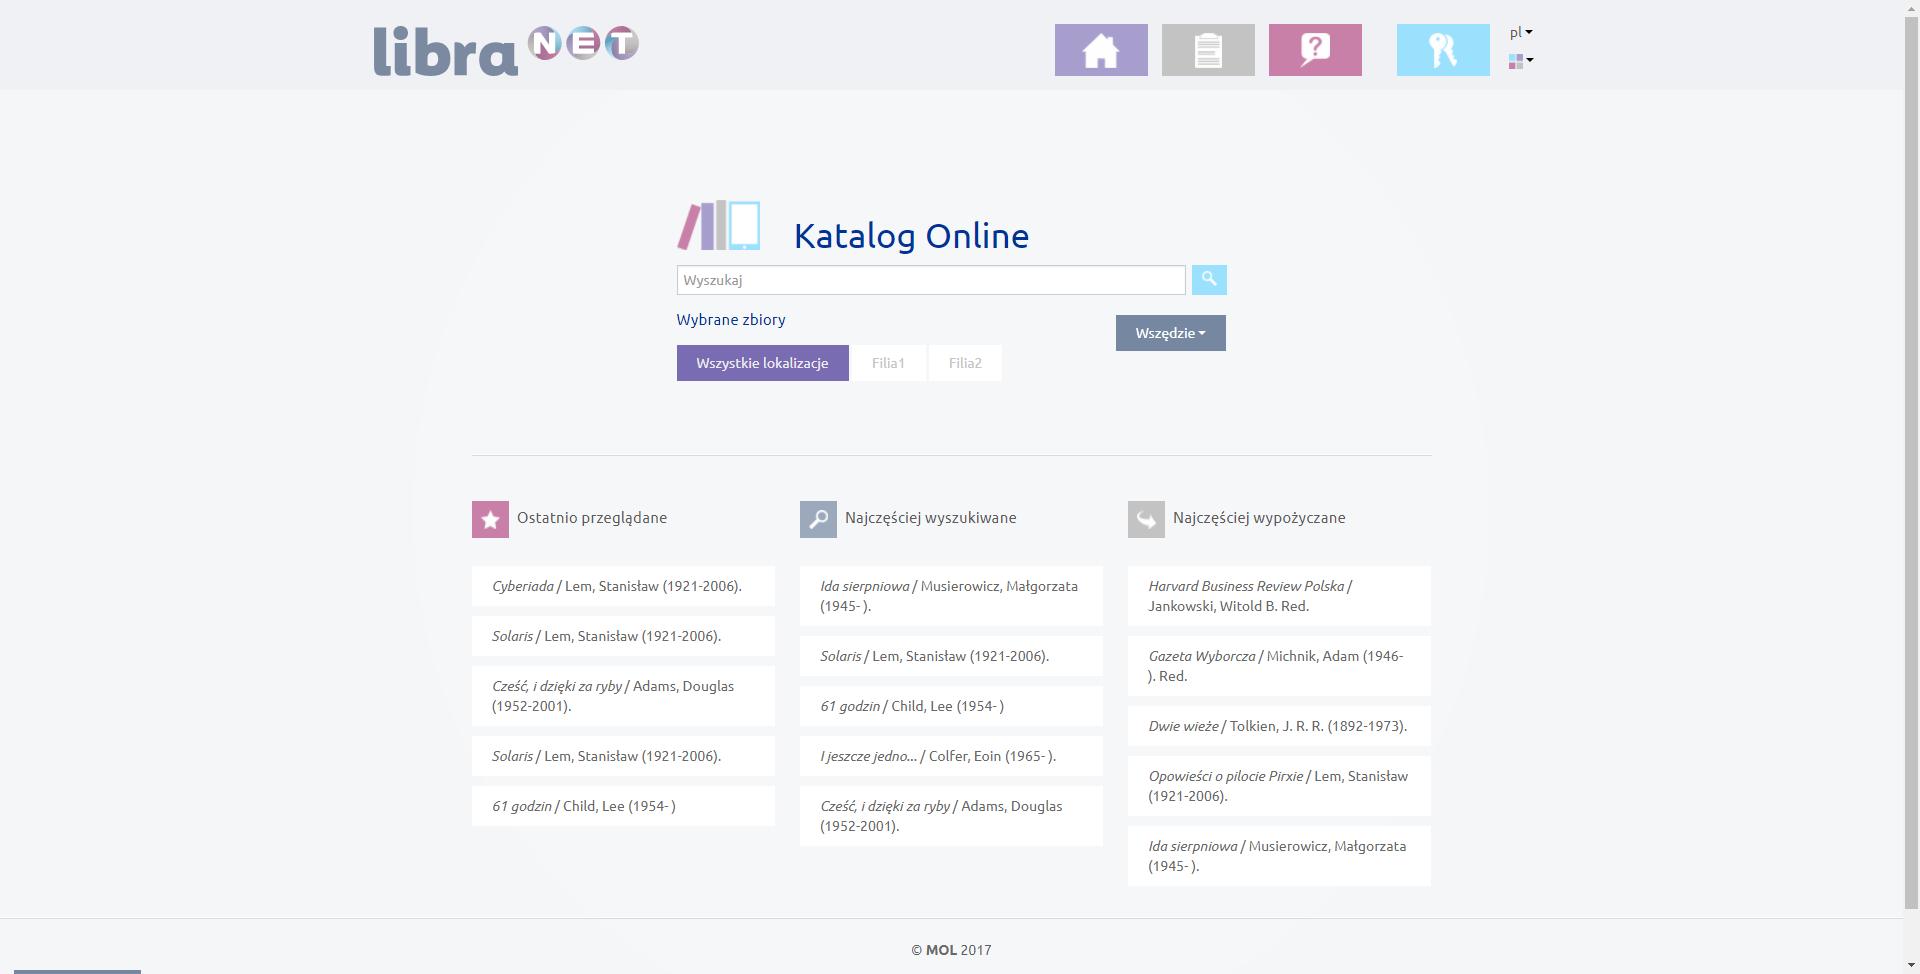 Libra NET - katalog on-line